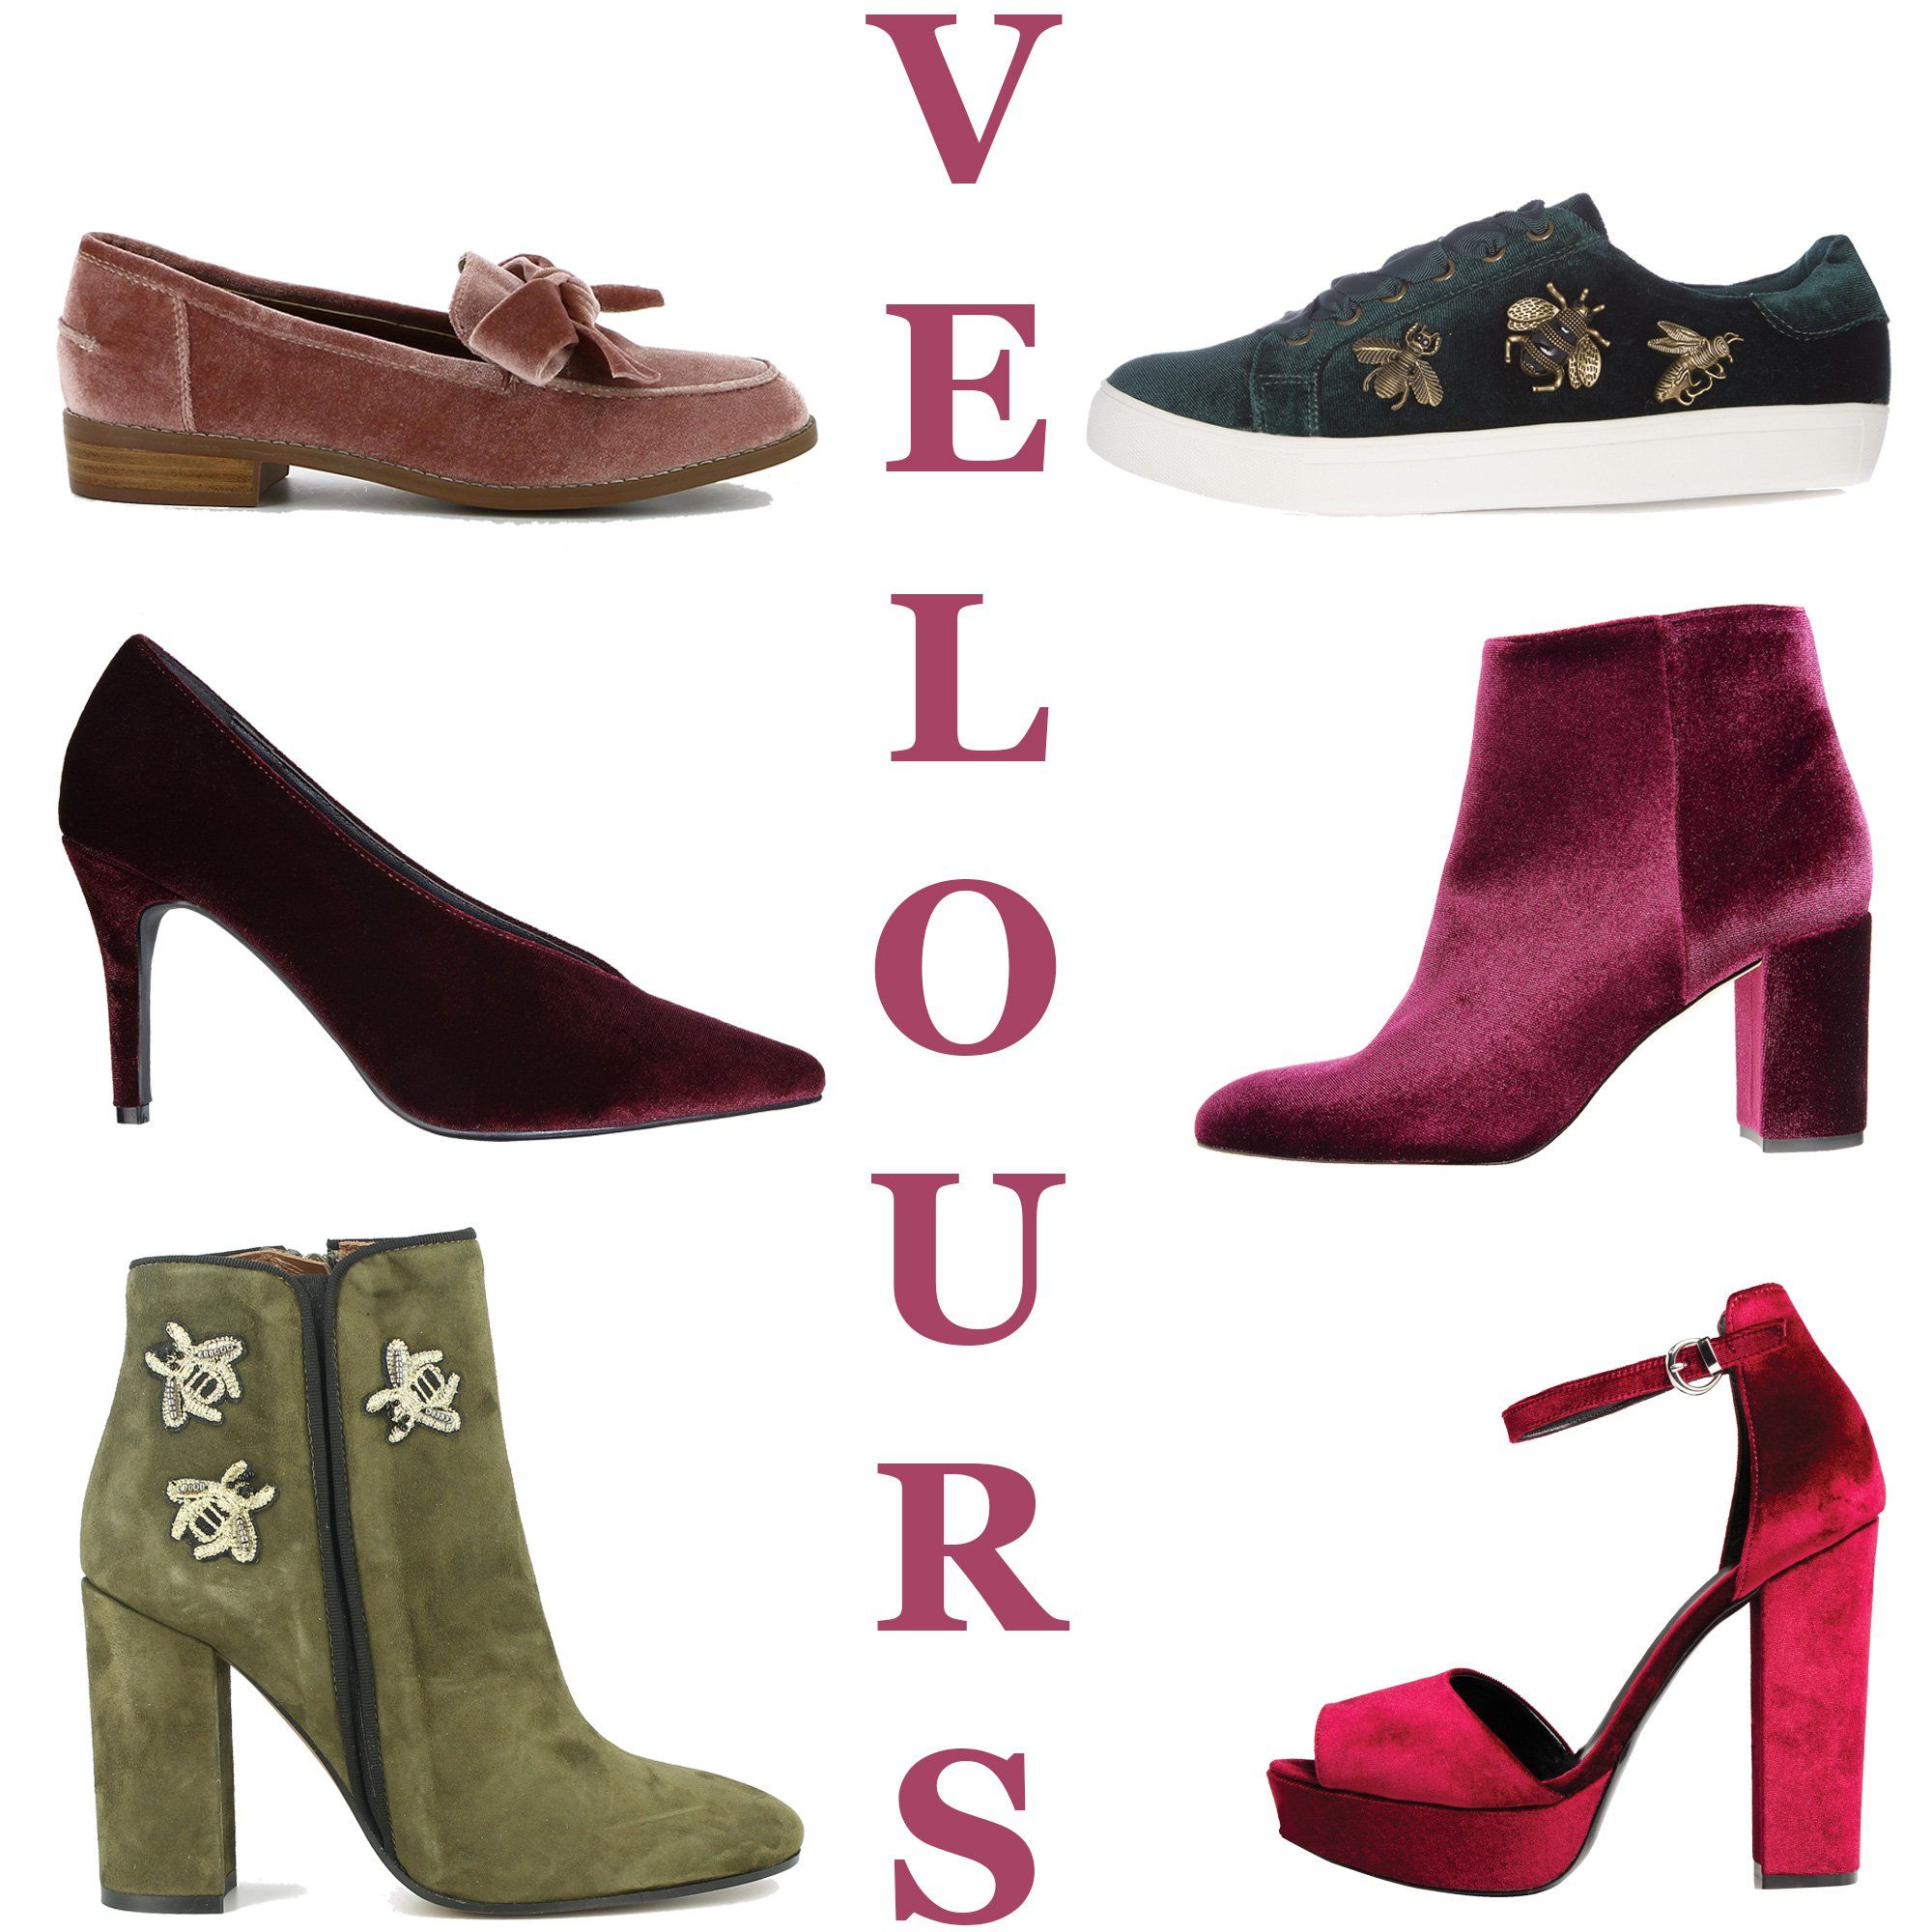 Chaussures automne hiver 2017-2018 : le velours